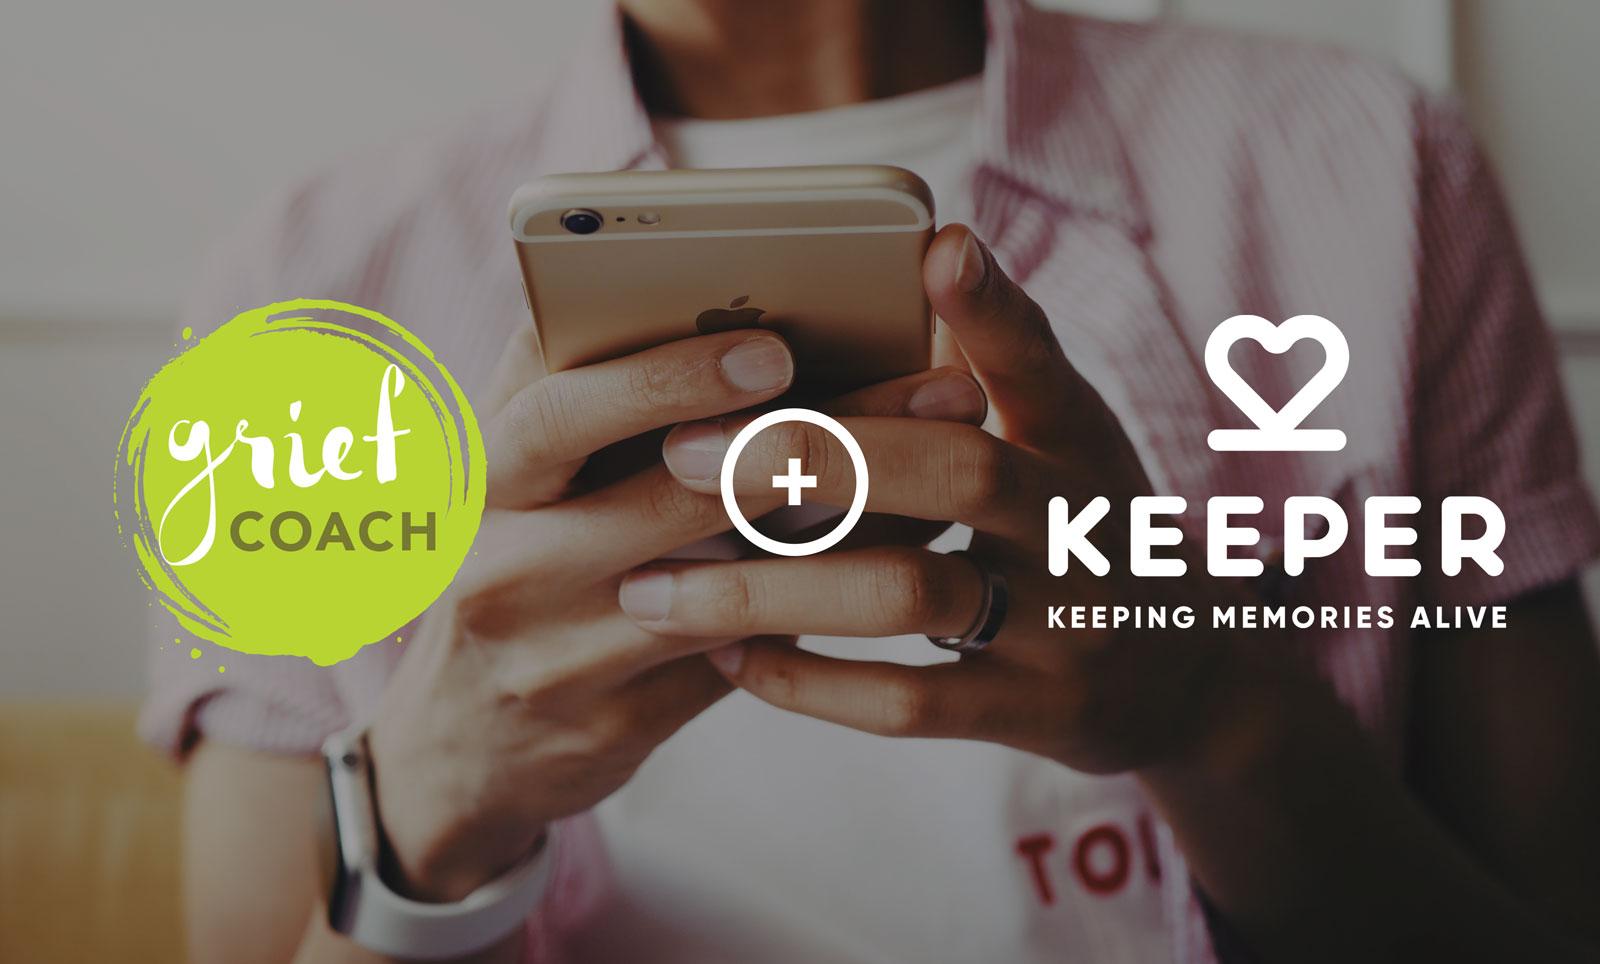 Keeper Online Memorials and Grief Coach